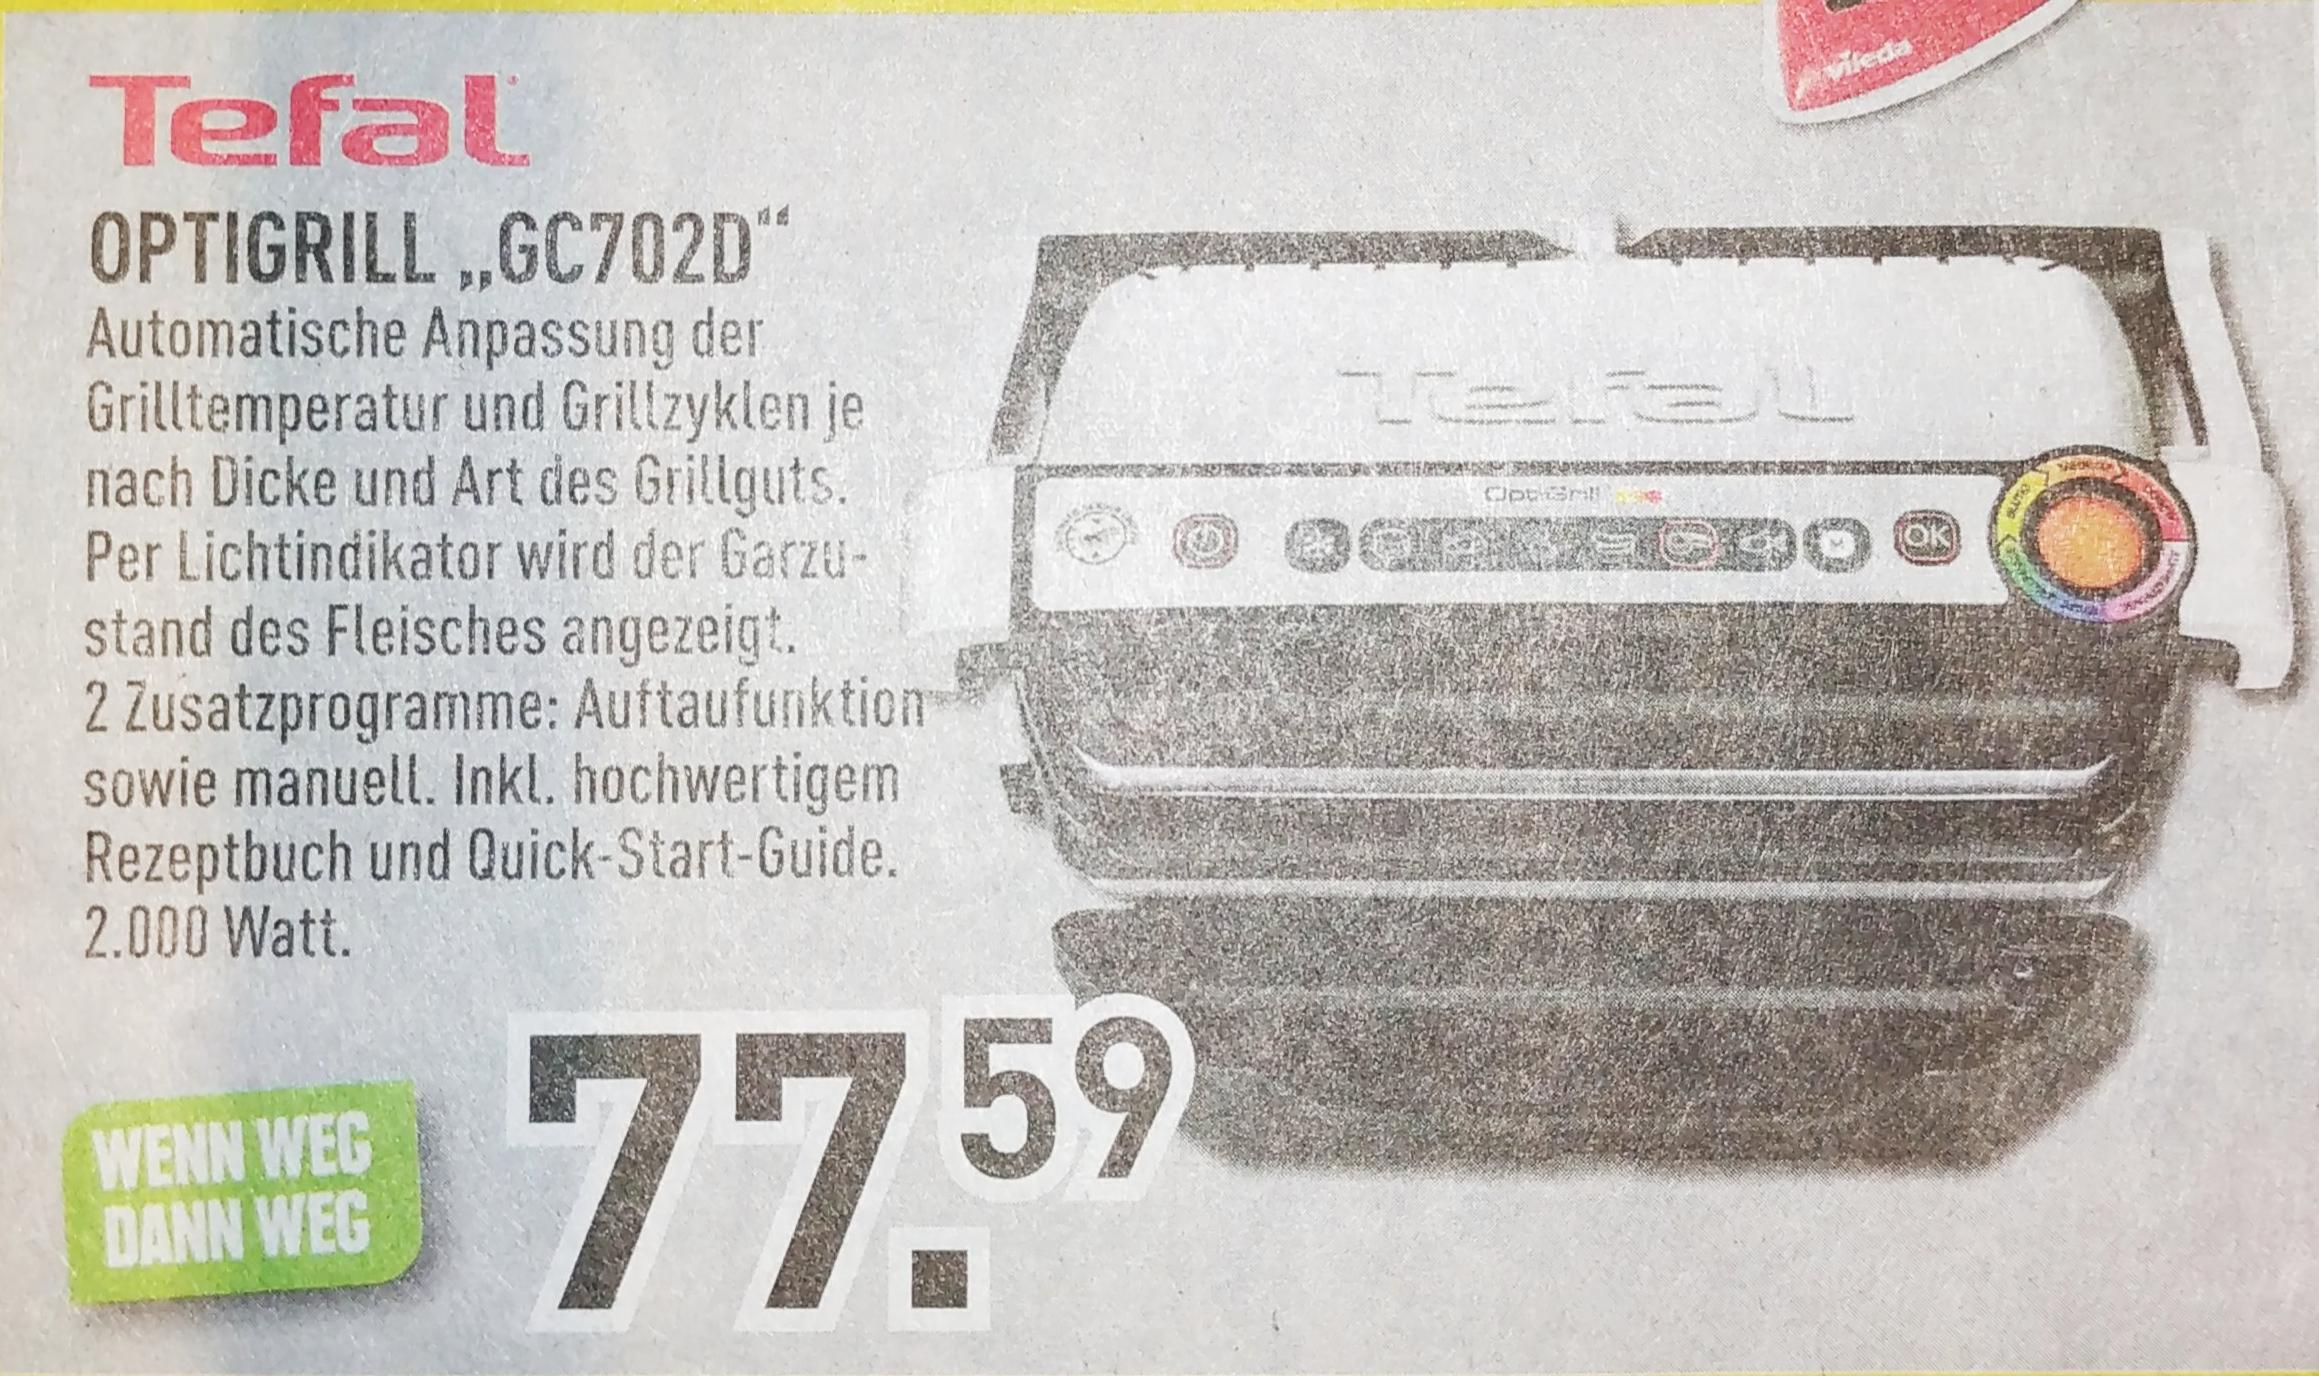 Tefal Optigrill GC702D - Lokal 41236